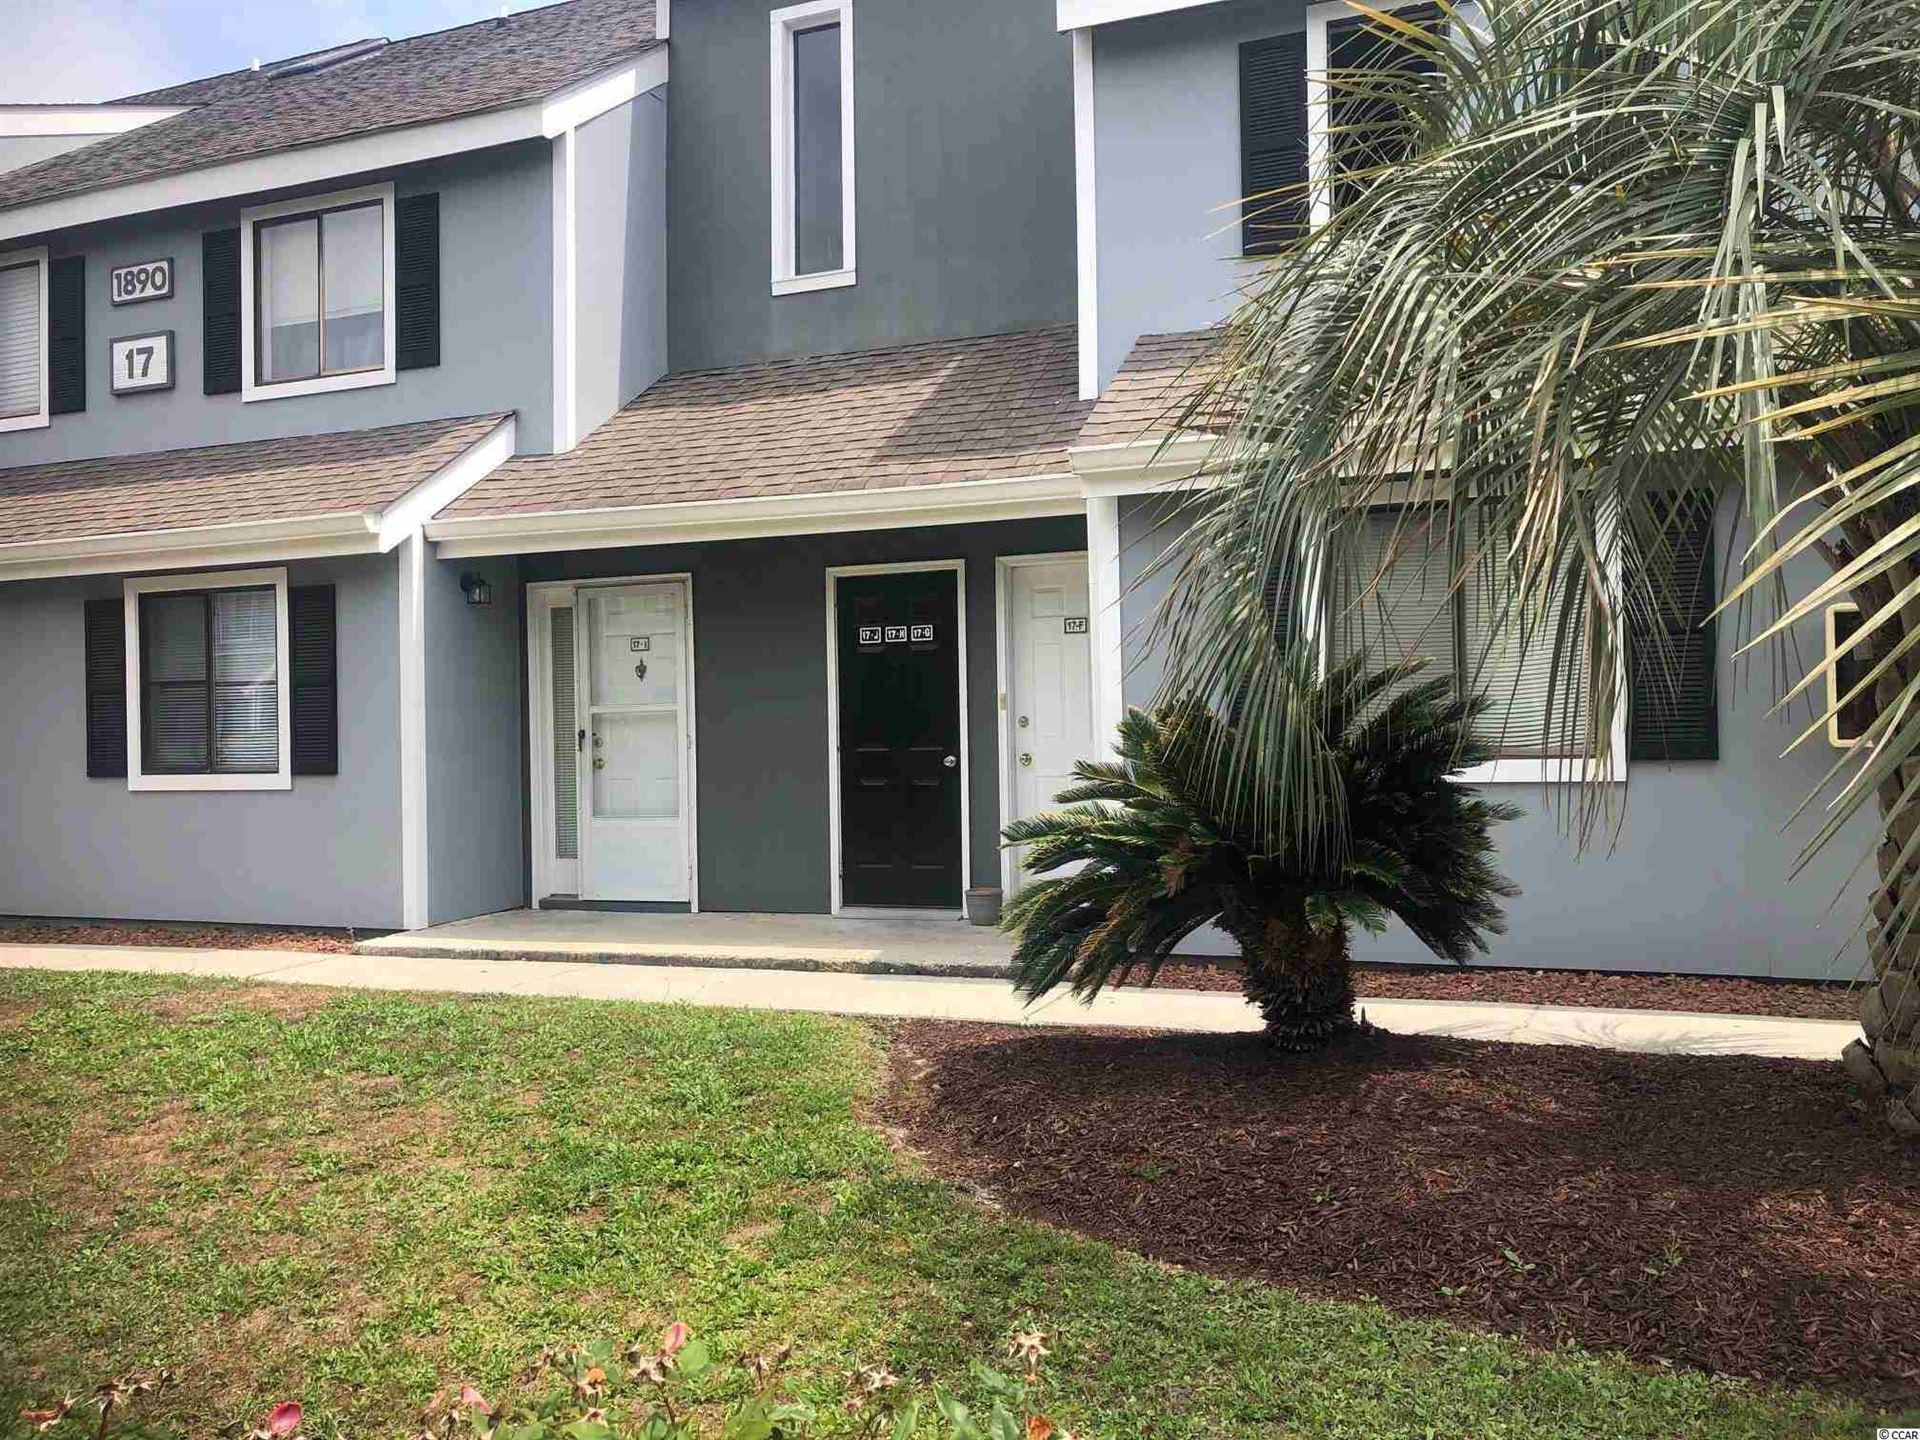 1890 Colony Dr. #17-G, Myrtle Beach, SC 29575 - MLS#: 2110644